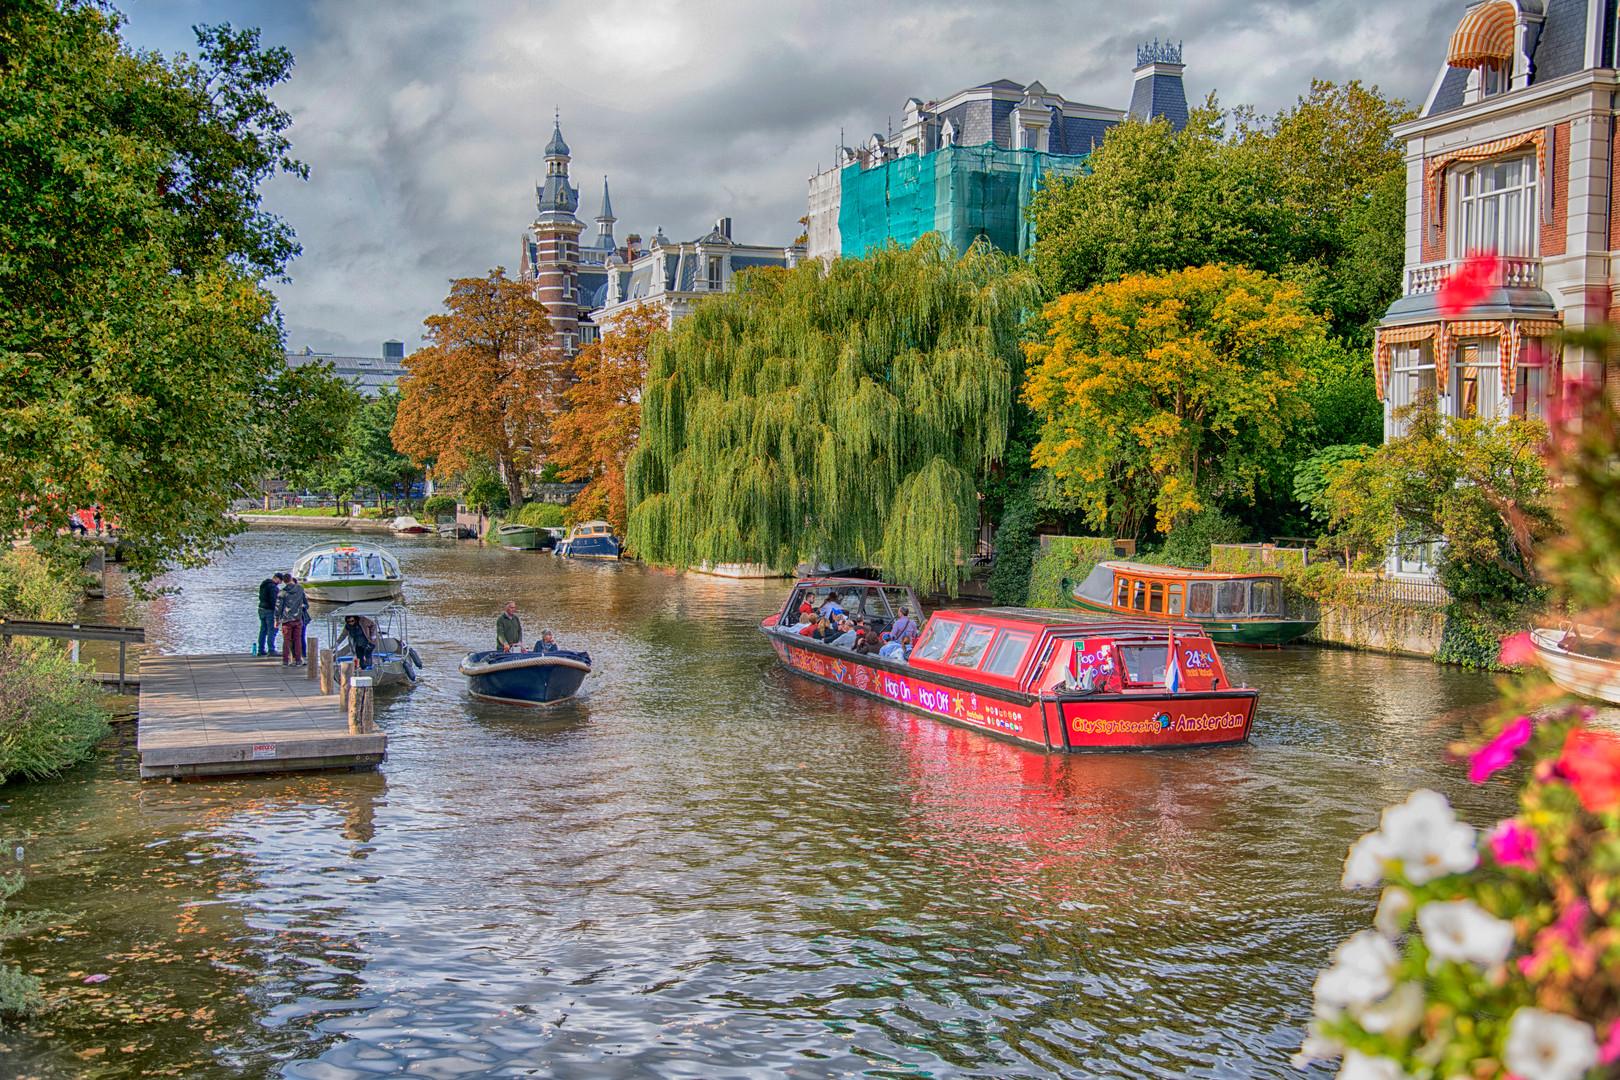 Amsterdam Canal - 003 - A.jpg